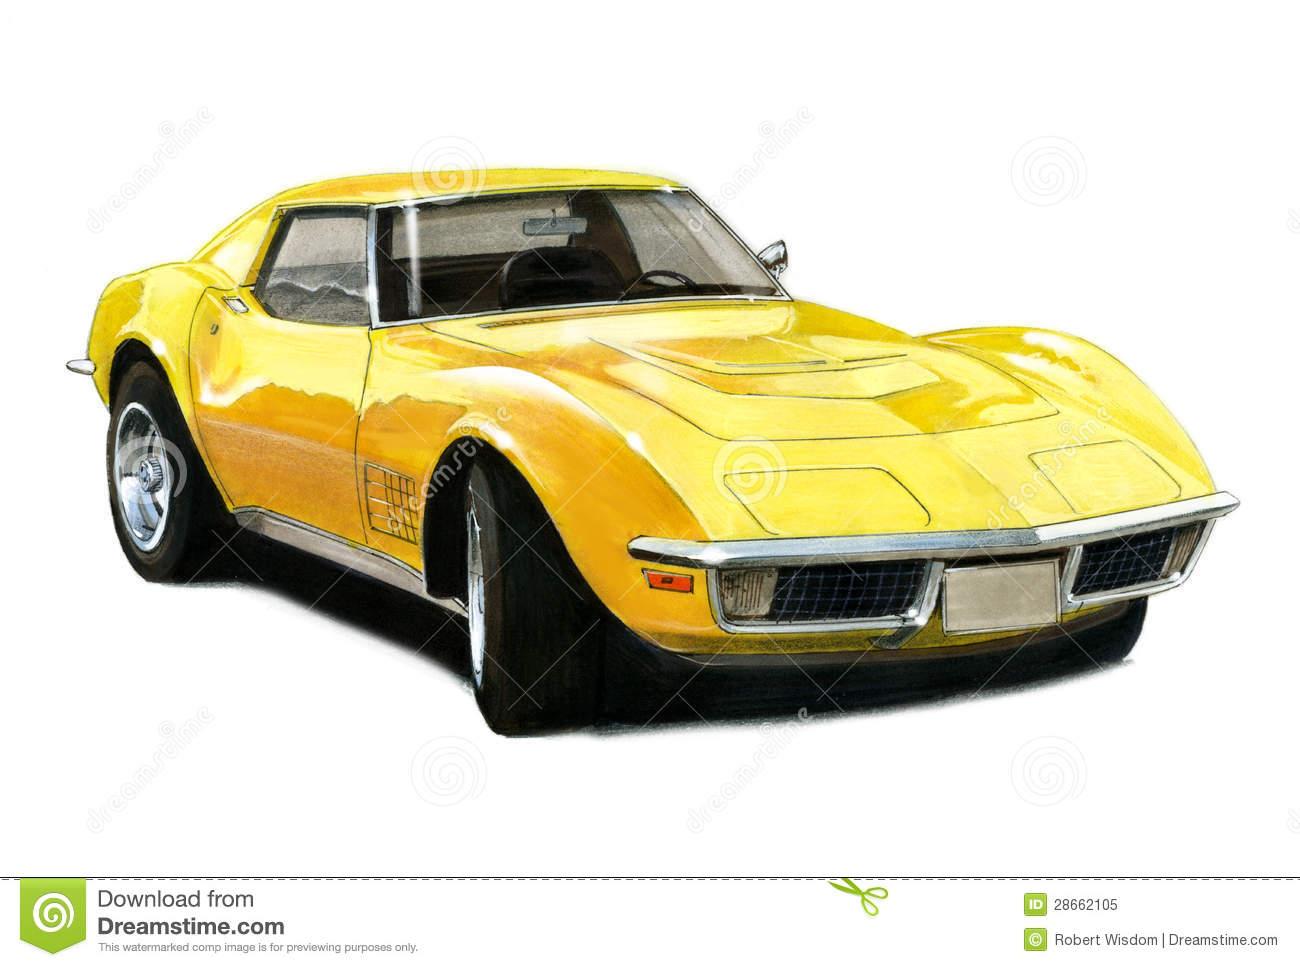 Chevrolet Stock Illustrations U2013 359 -Chevrolet Stock Illustrations u2013 359 Chevrolet Stock Illustrations, Vectors  u0026 Clipart - Dreamstime-13